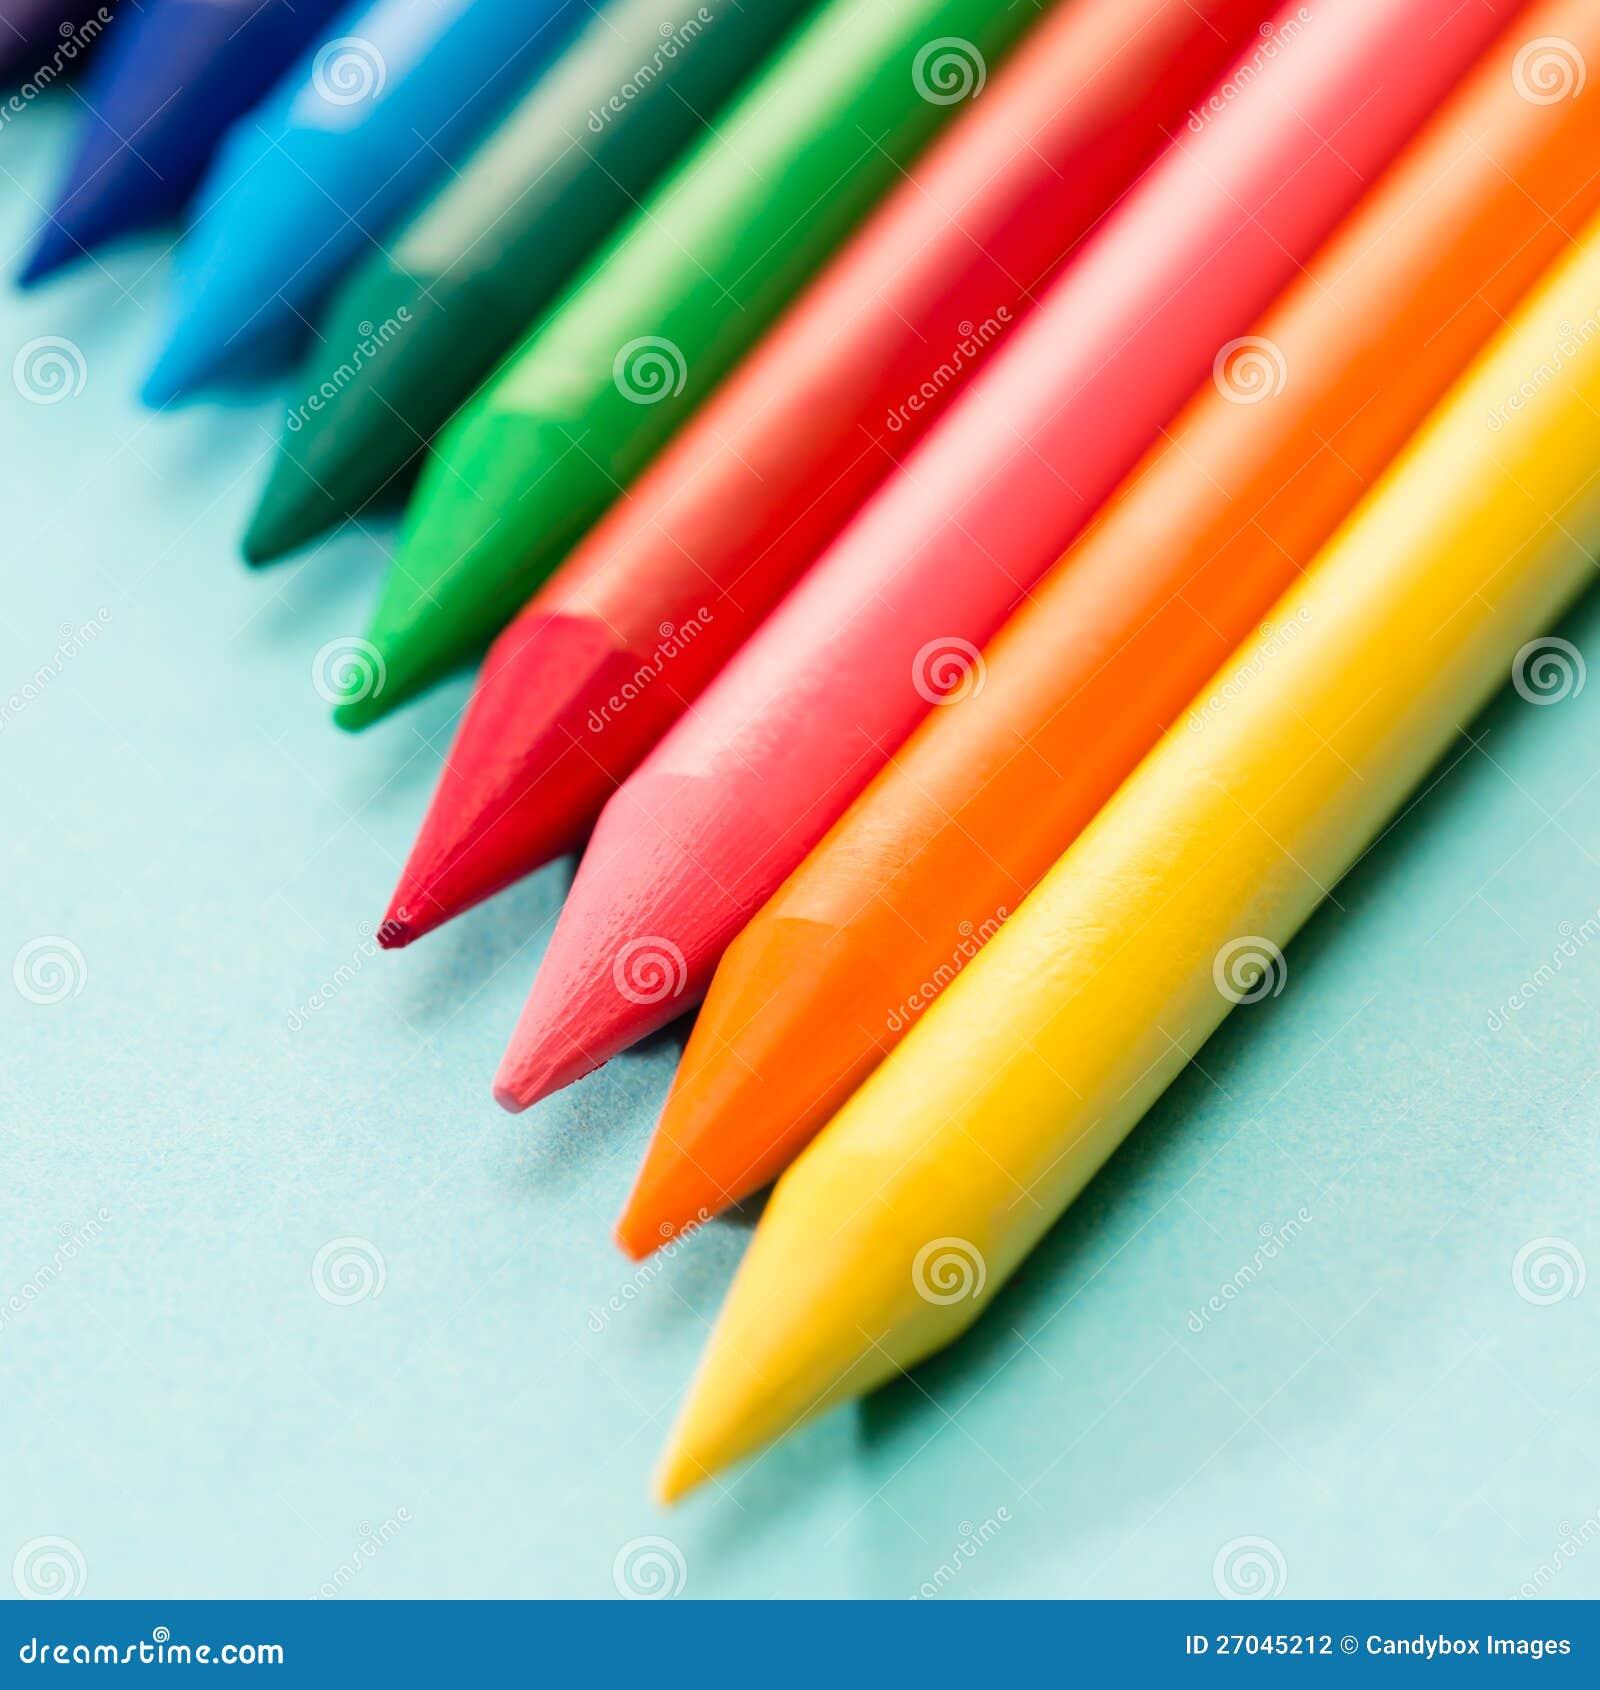 Kids Coloring Crayons School Art Stock Photography